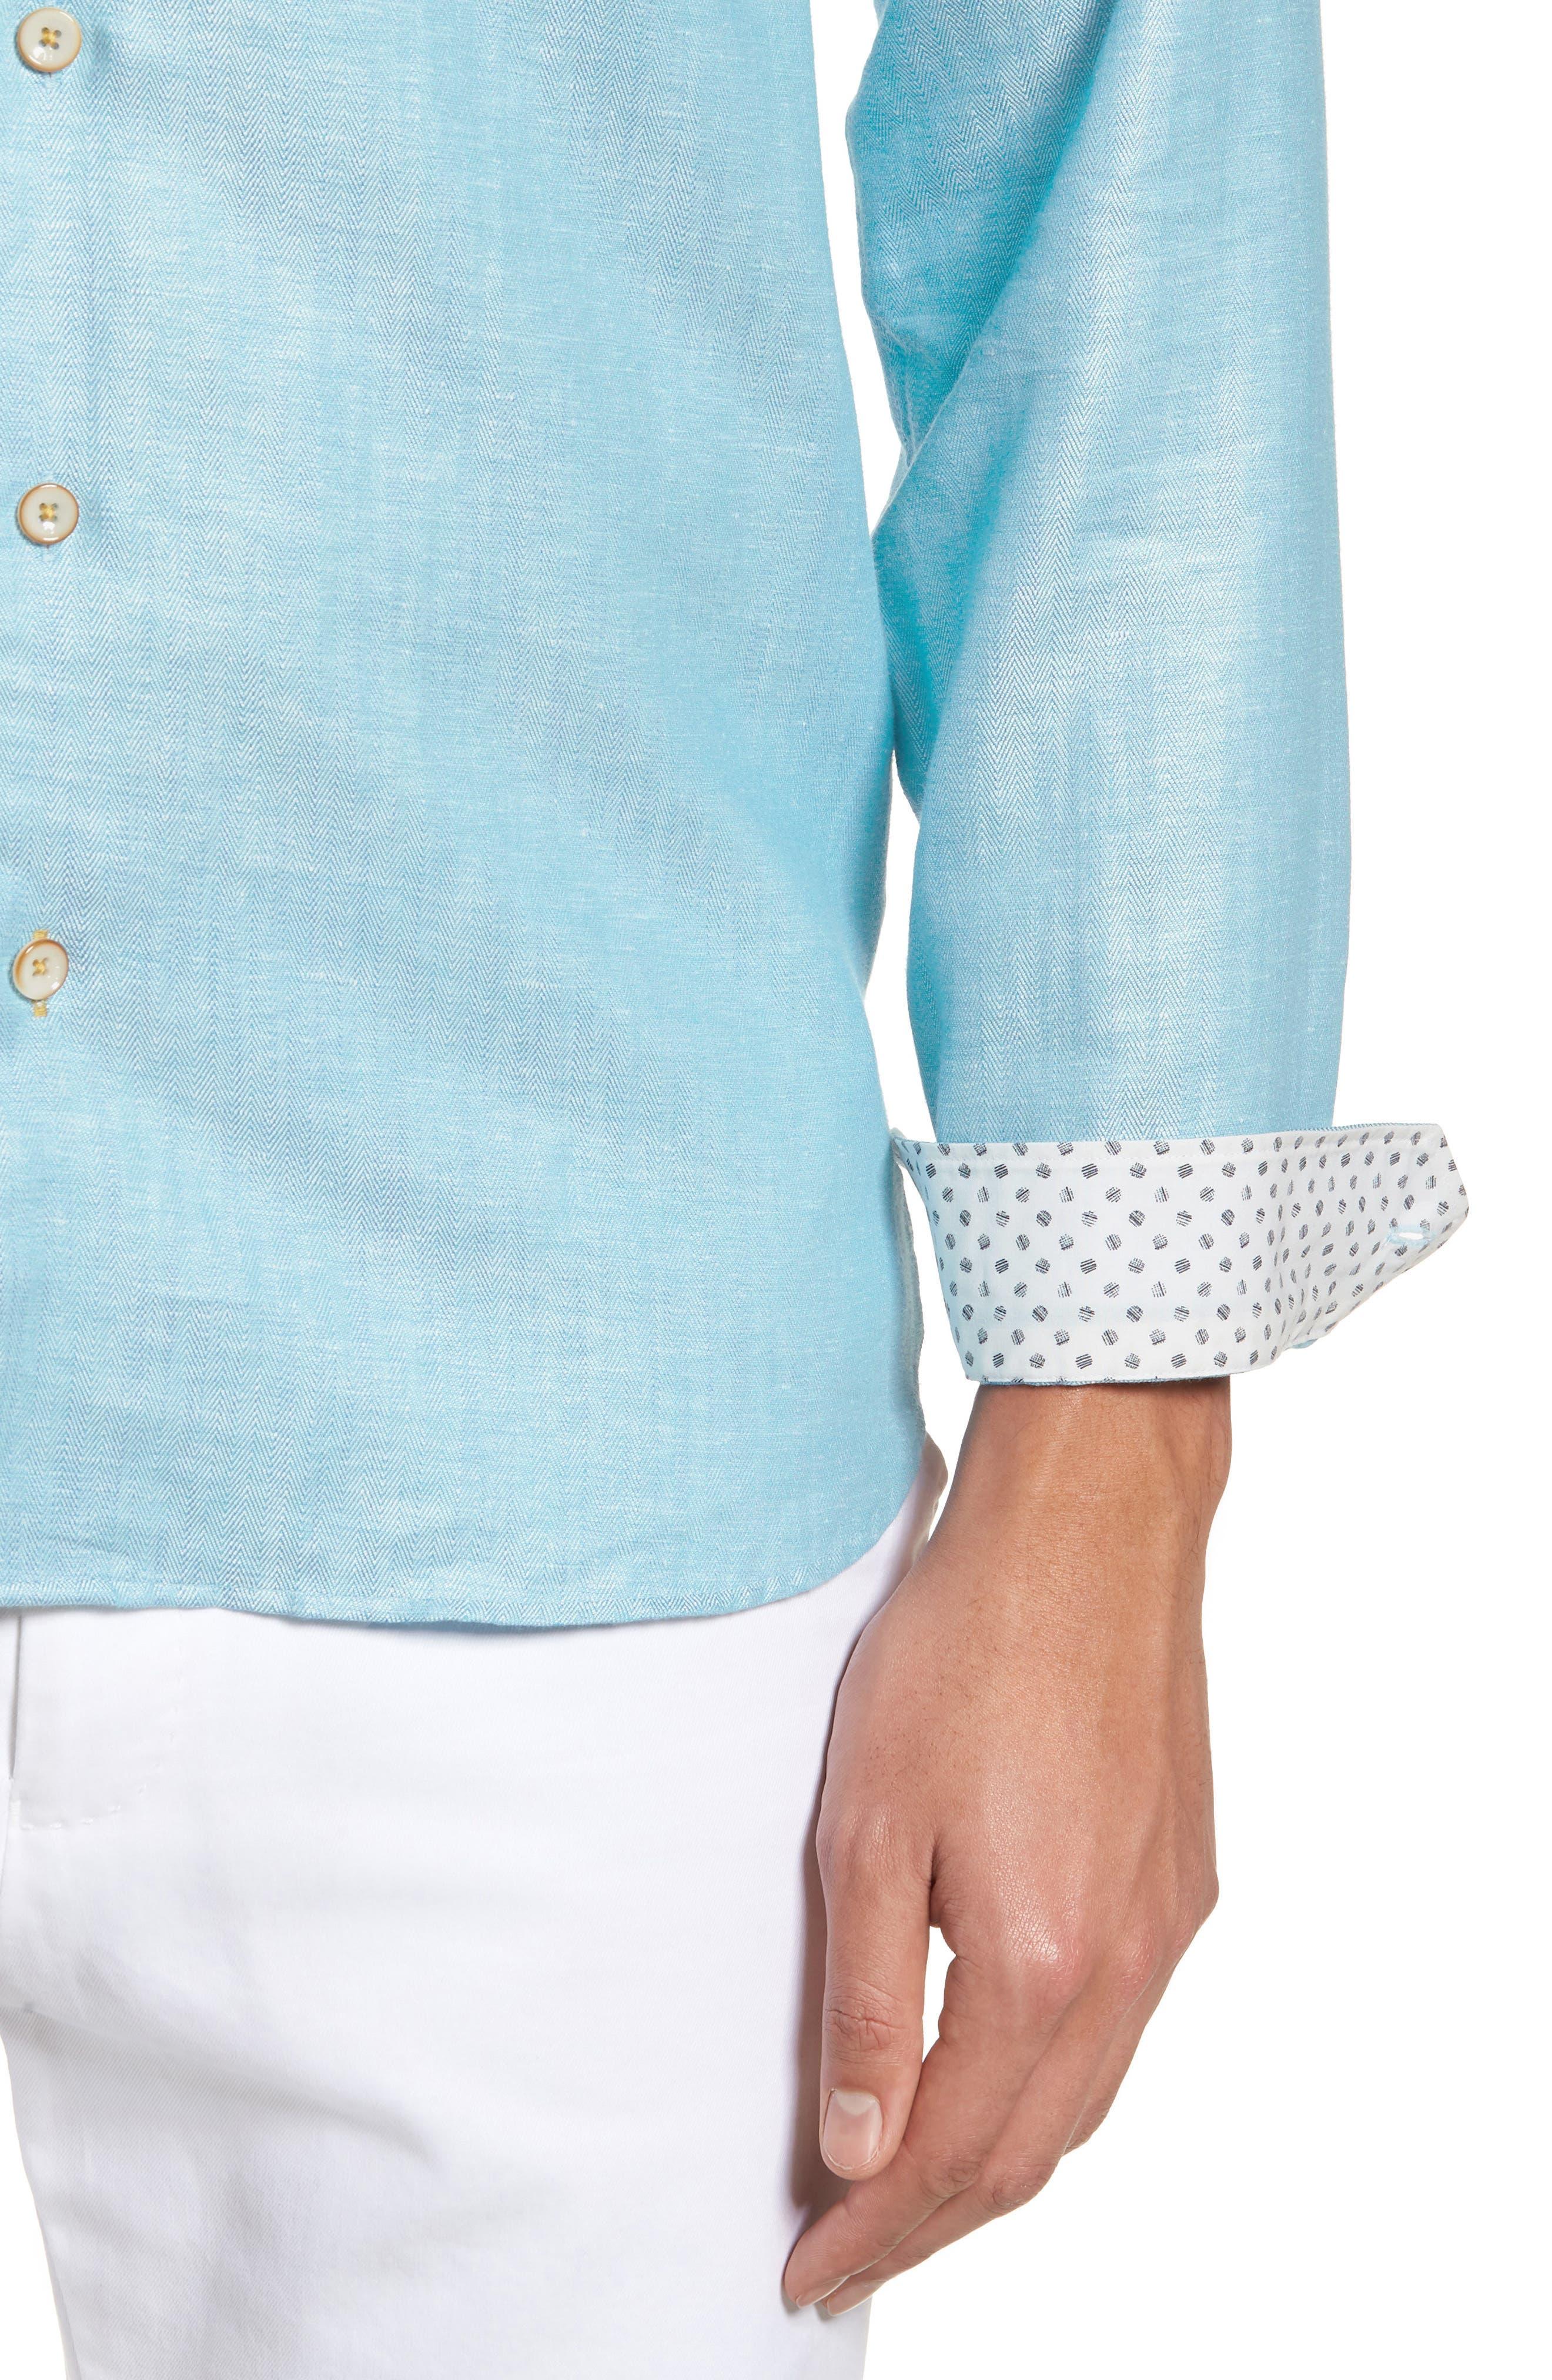 Linlins Herringbone Cotton & Linen Sport Shirt,                             Alternate thumbnail 19, color,